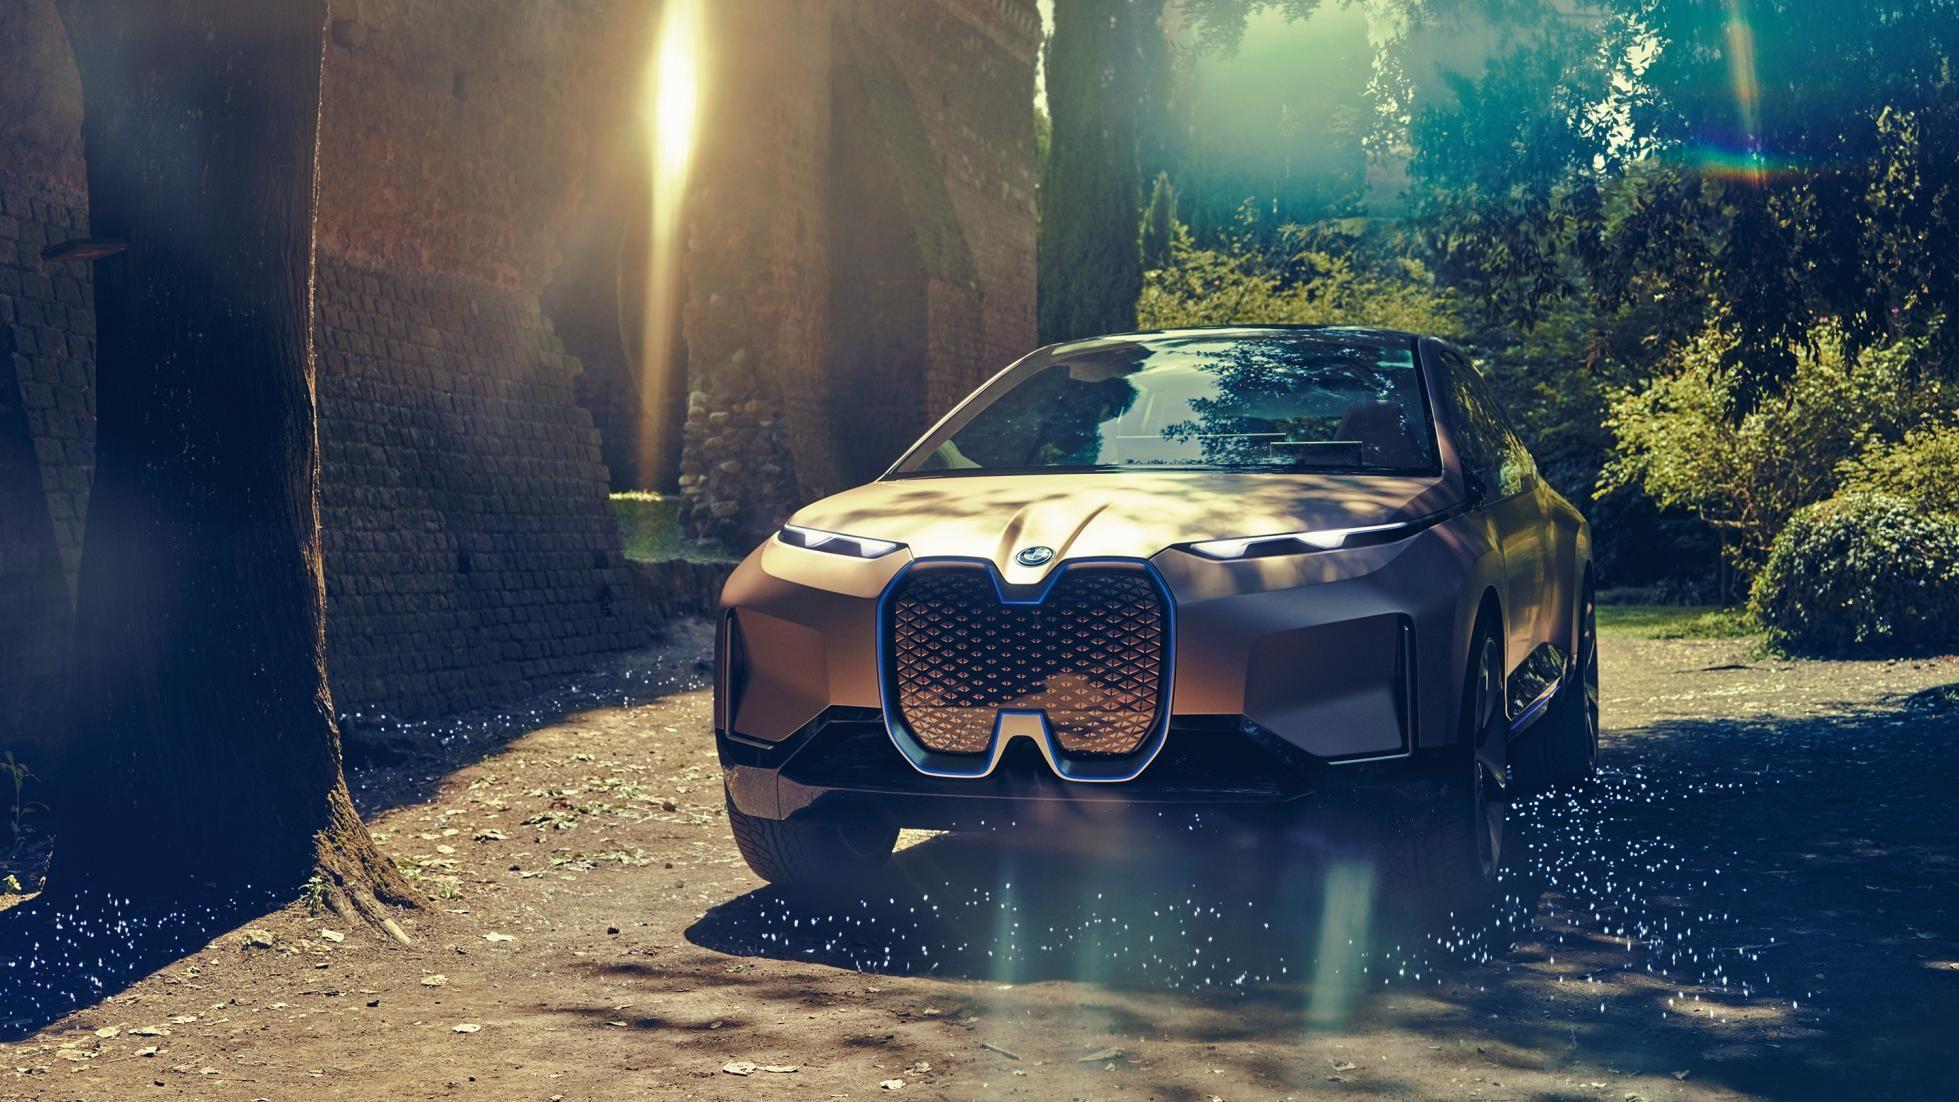 The Vision iNext is BMW's first level 3 autonomous car